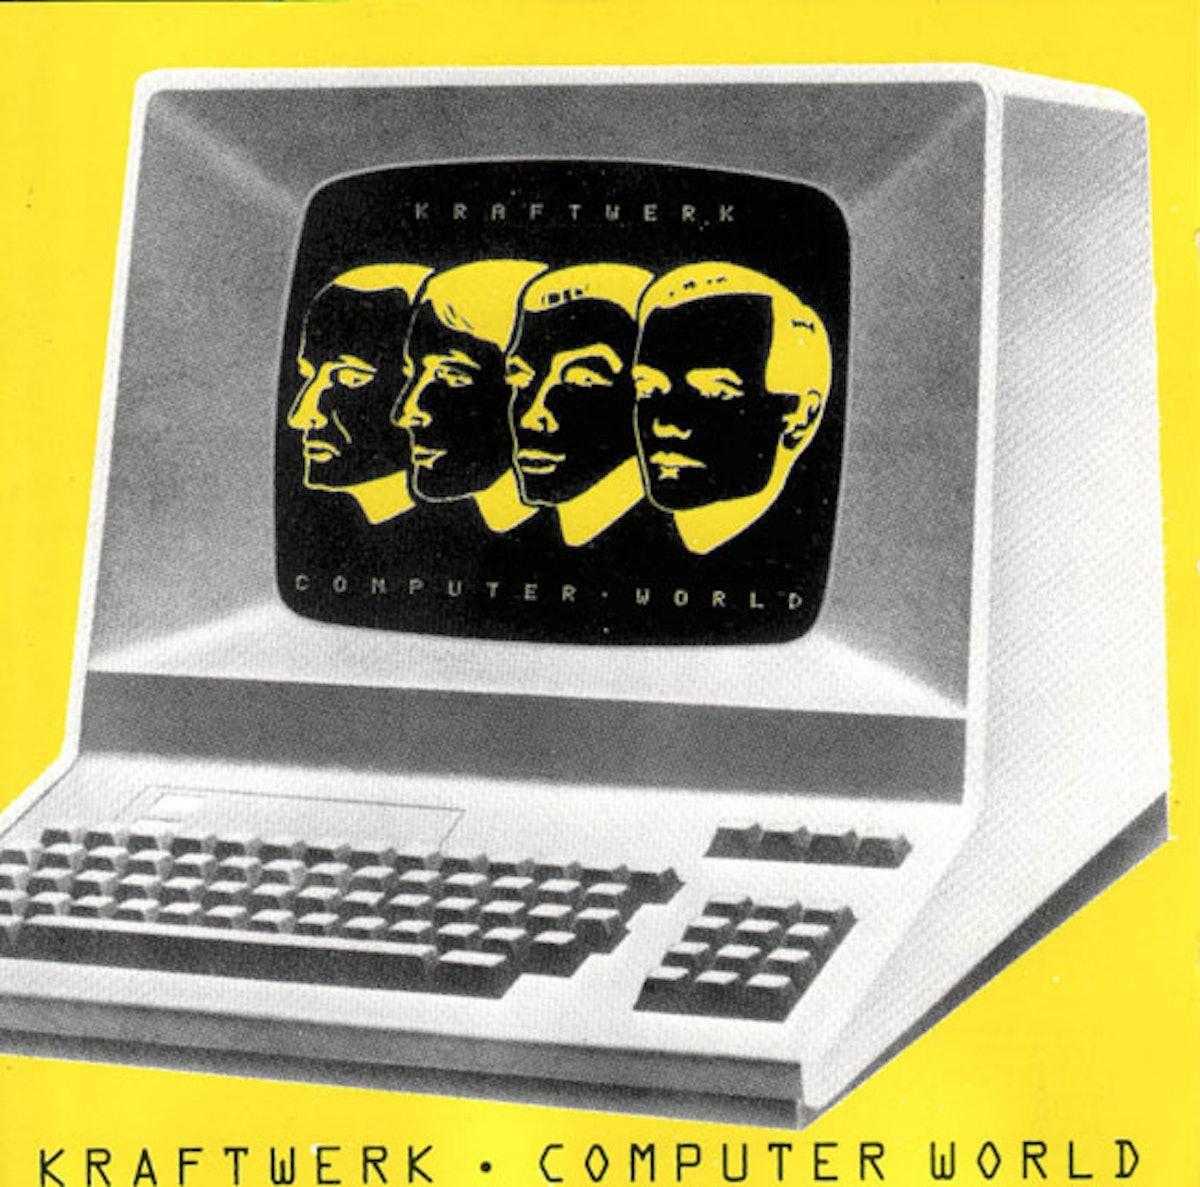 blog-Kraftwerk-Computer-World.jpg